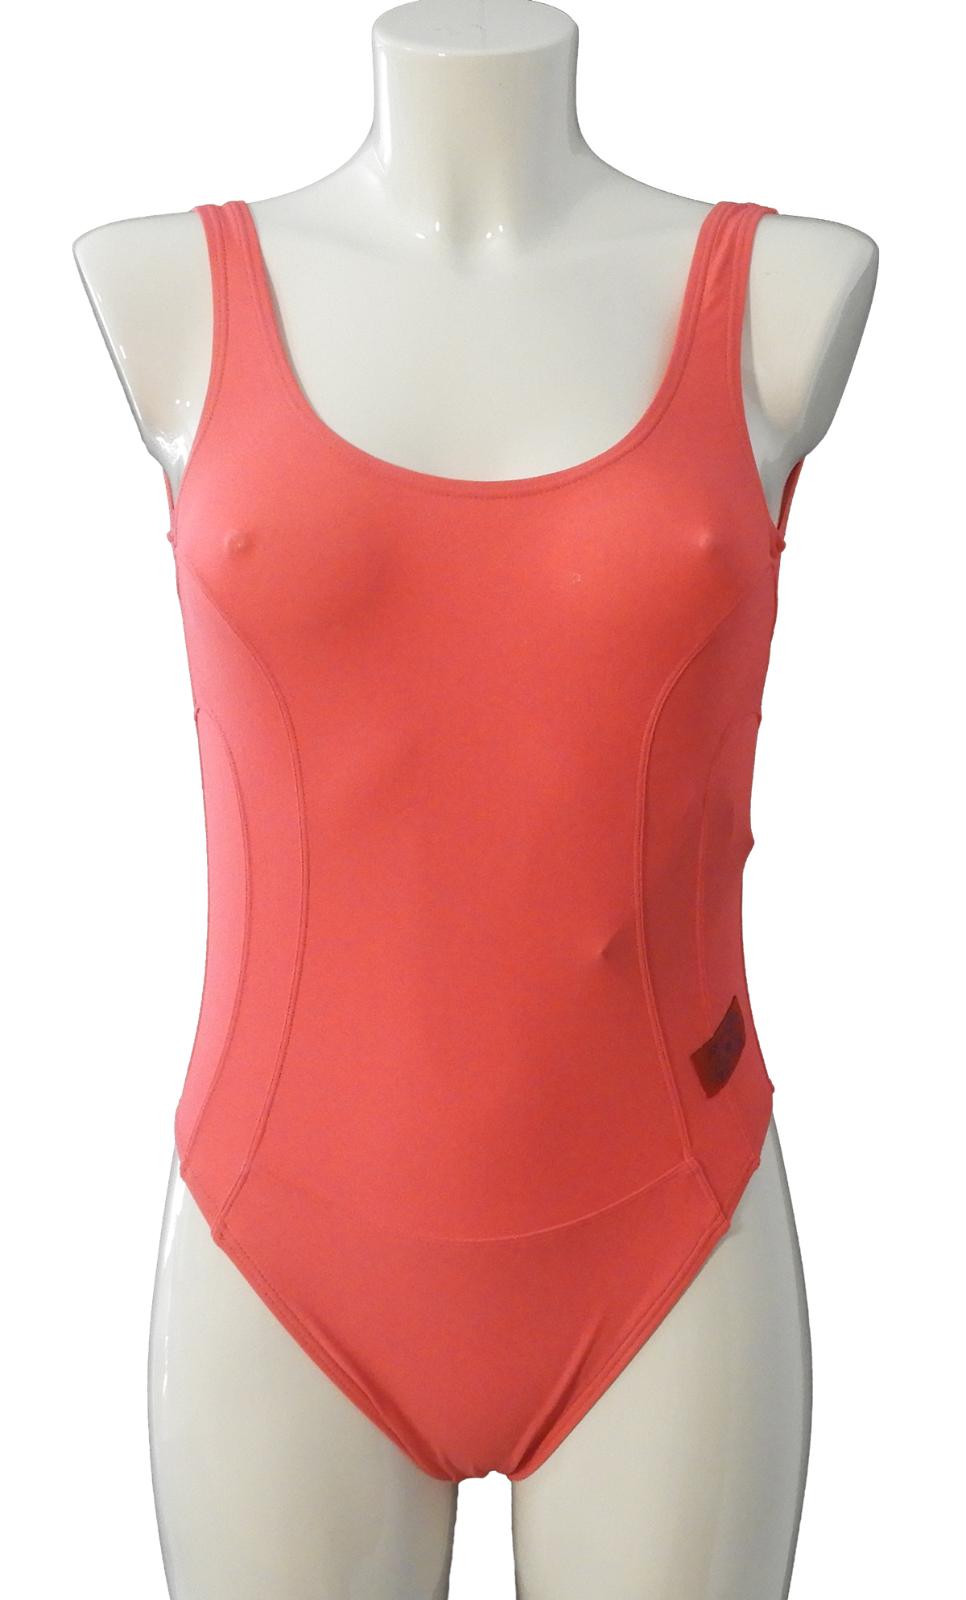 Oxbow Damen Badeanzug  - Bademode - Größe 38 - Pink - 99120